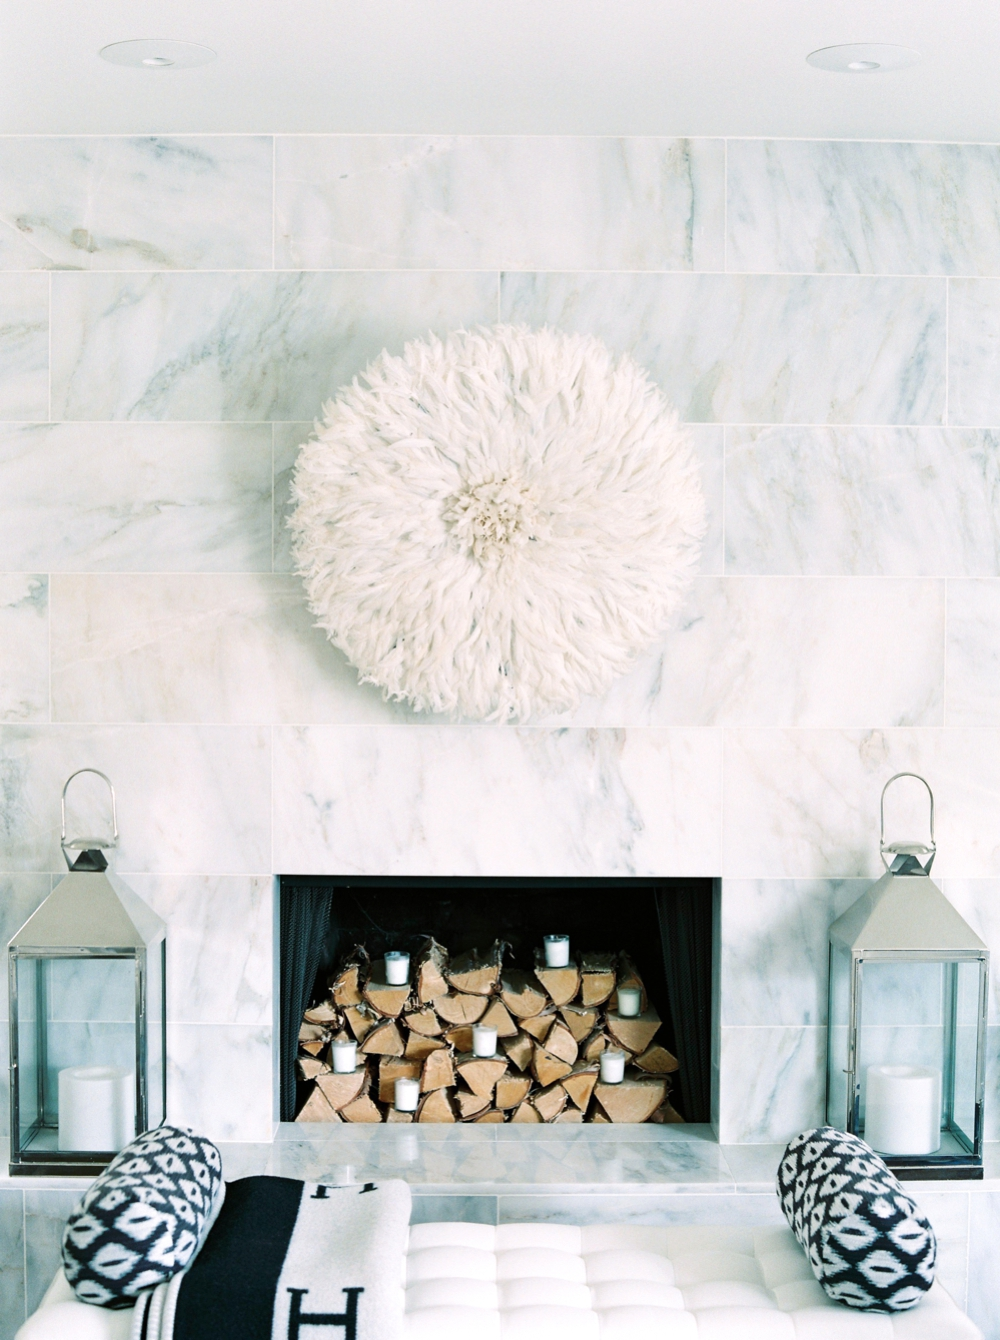 Calgary Interior Photographers | Commercial Photography | Erica Cook Interior Designer Moth Design Calgary | All White House